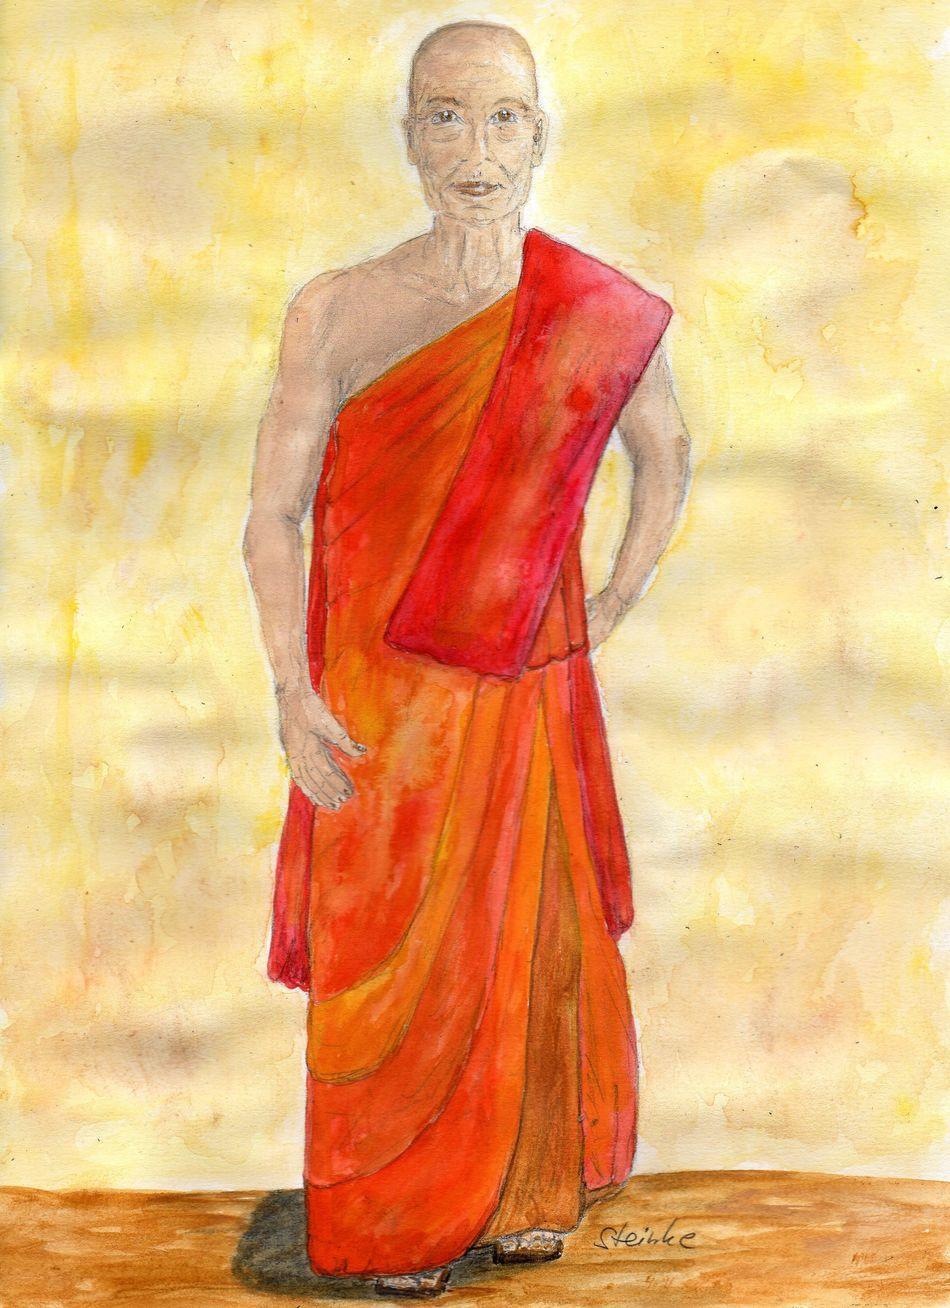 Buddhism Buddhist Buddhist Monks Buddhist Tradition Malerei Kunst Aquarell Watercolor Painting Watercolour Red Orange ArtWork Art Art, Drawing, Creativity Spirituell Drawing Zeichnung  Zeichnen Artist Enlightenment Energy Reikimaster SPIRITUAL HEALING